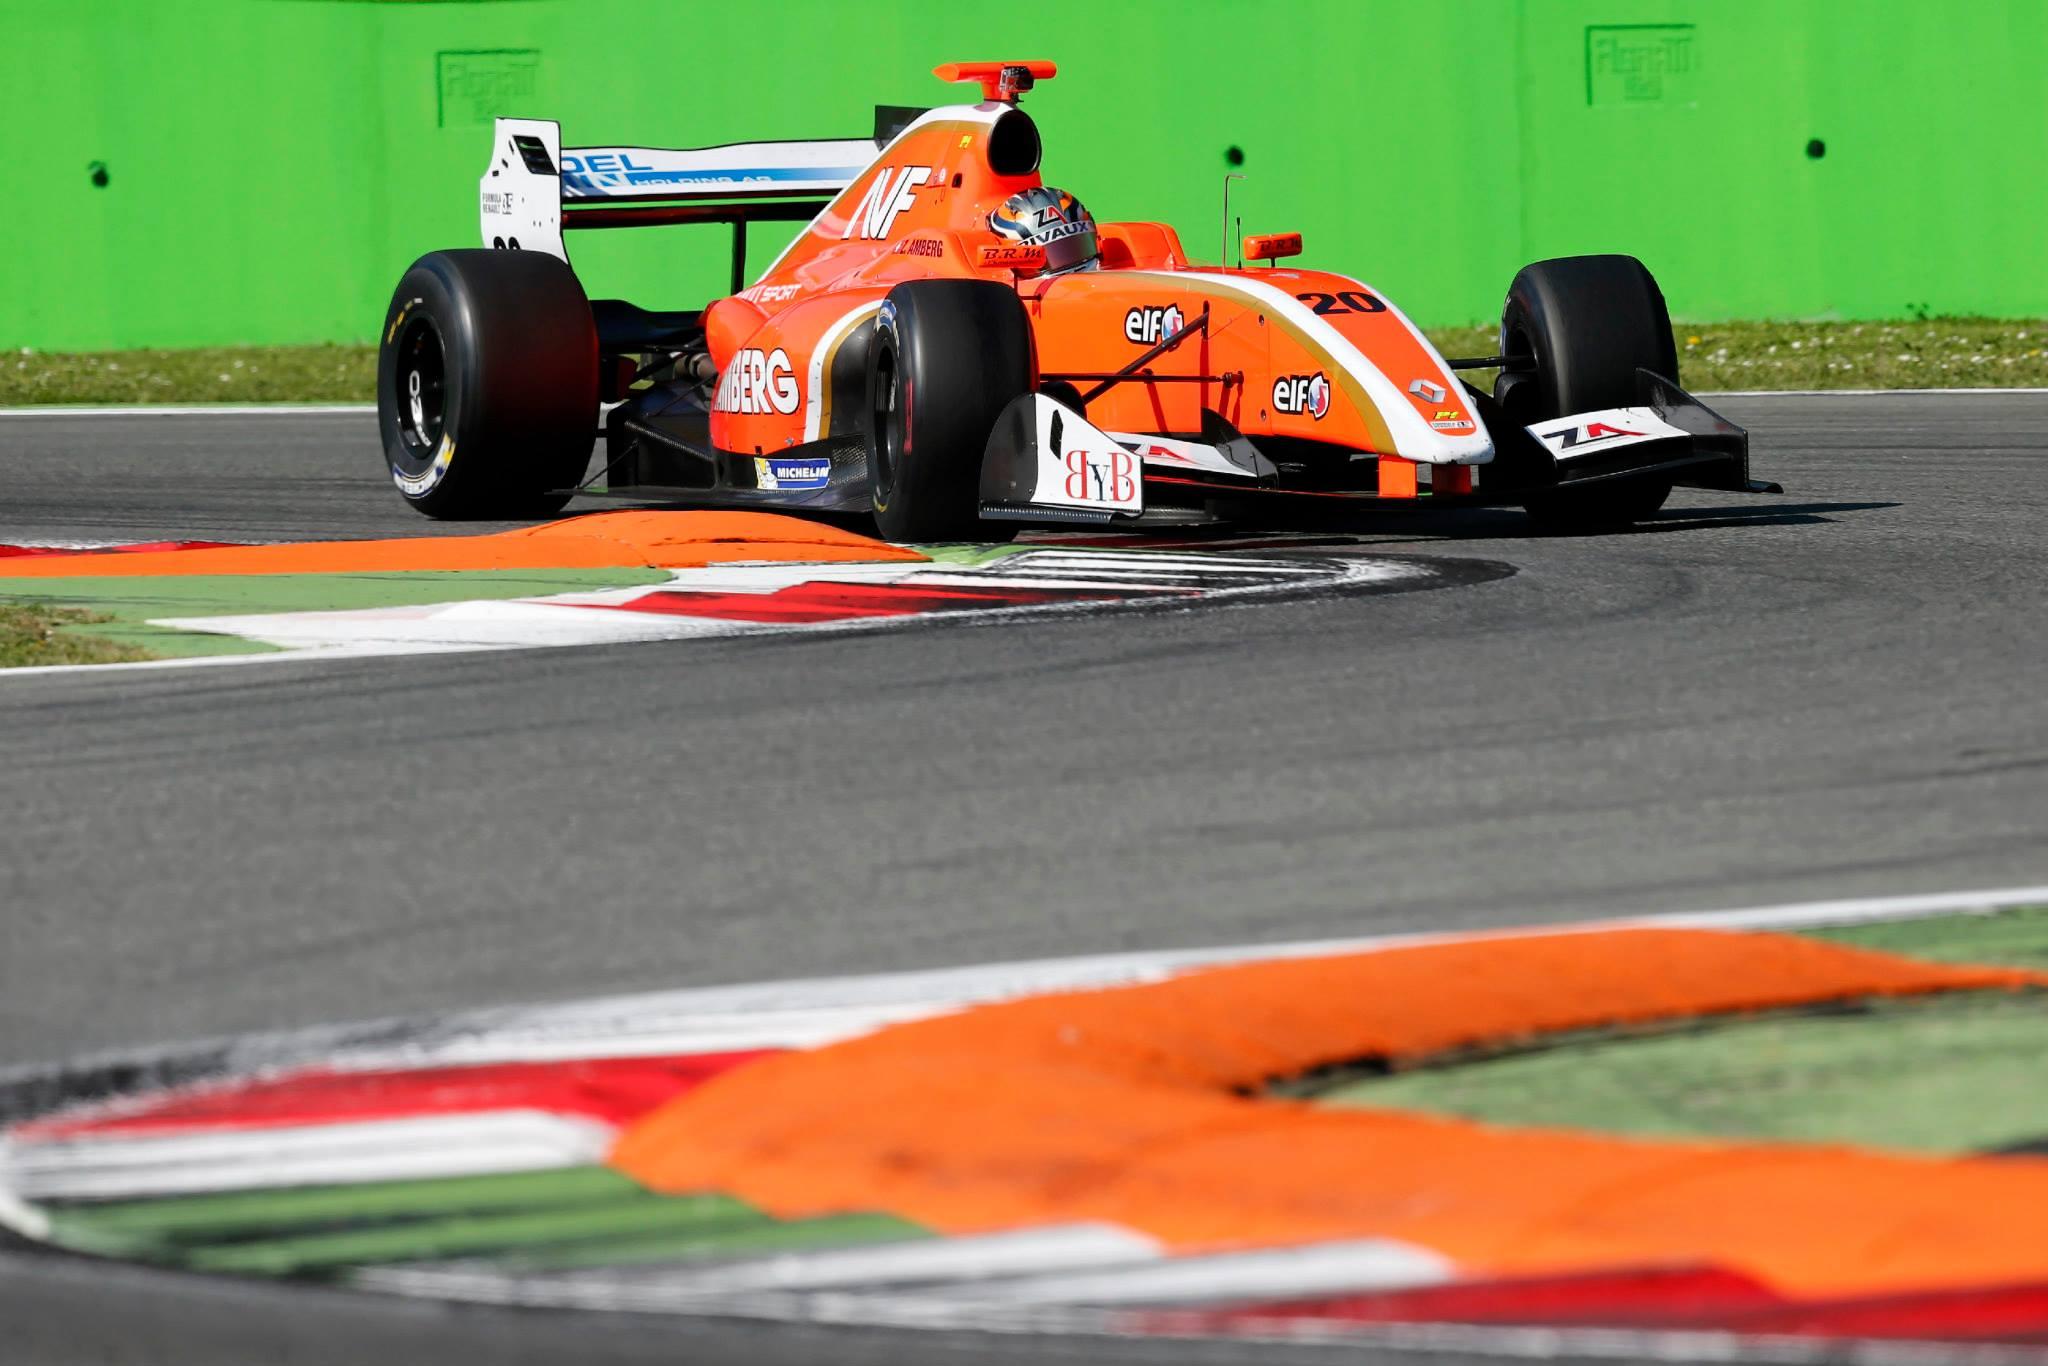 2014 Formula Renault 3.5 Series - Monza - Zoel Amberg